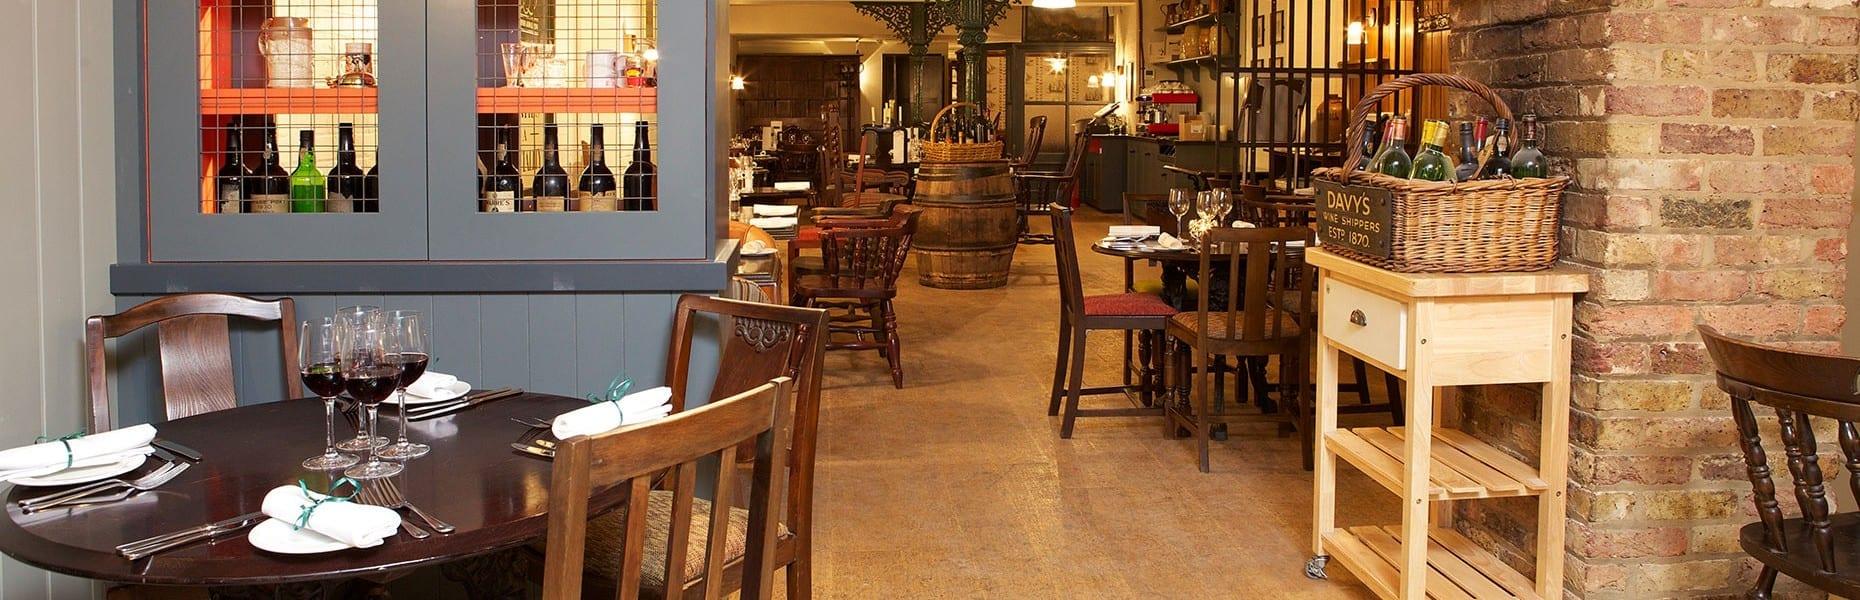 Bangers wine bar